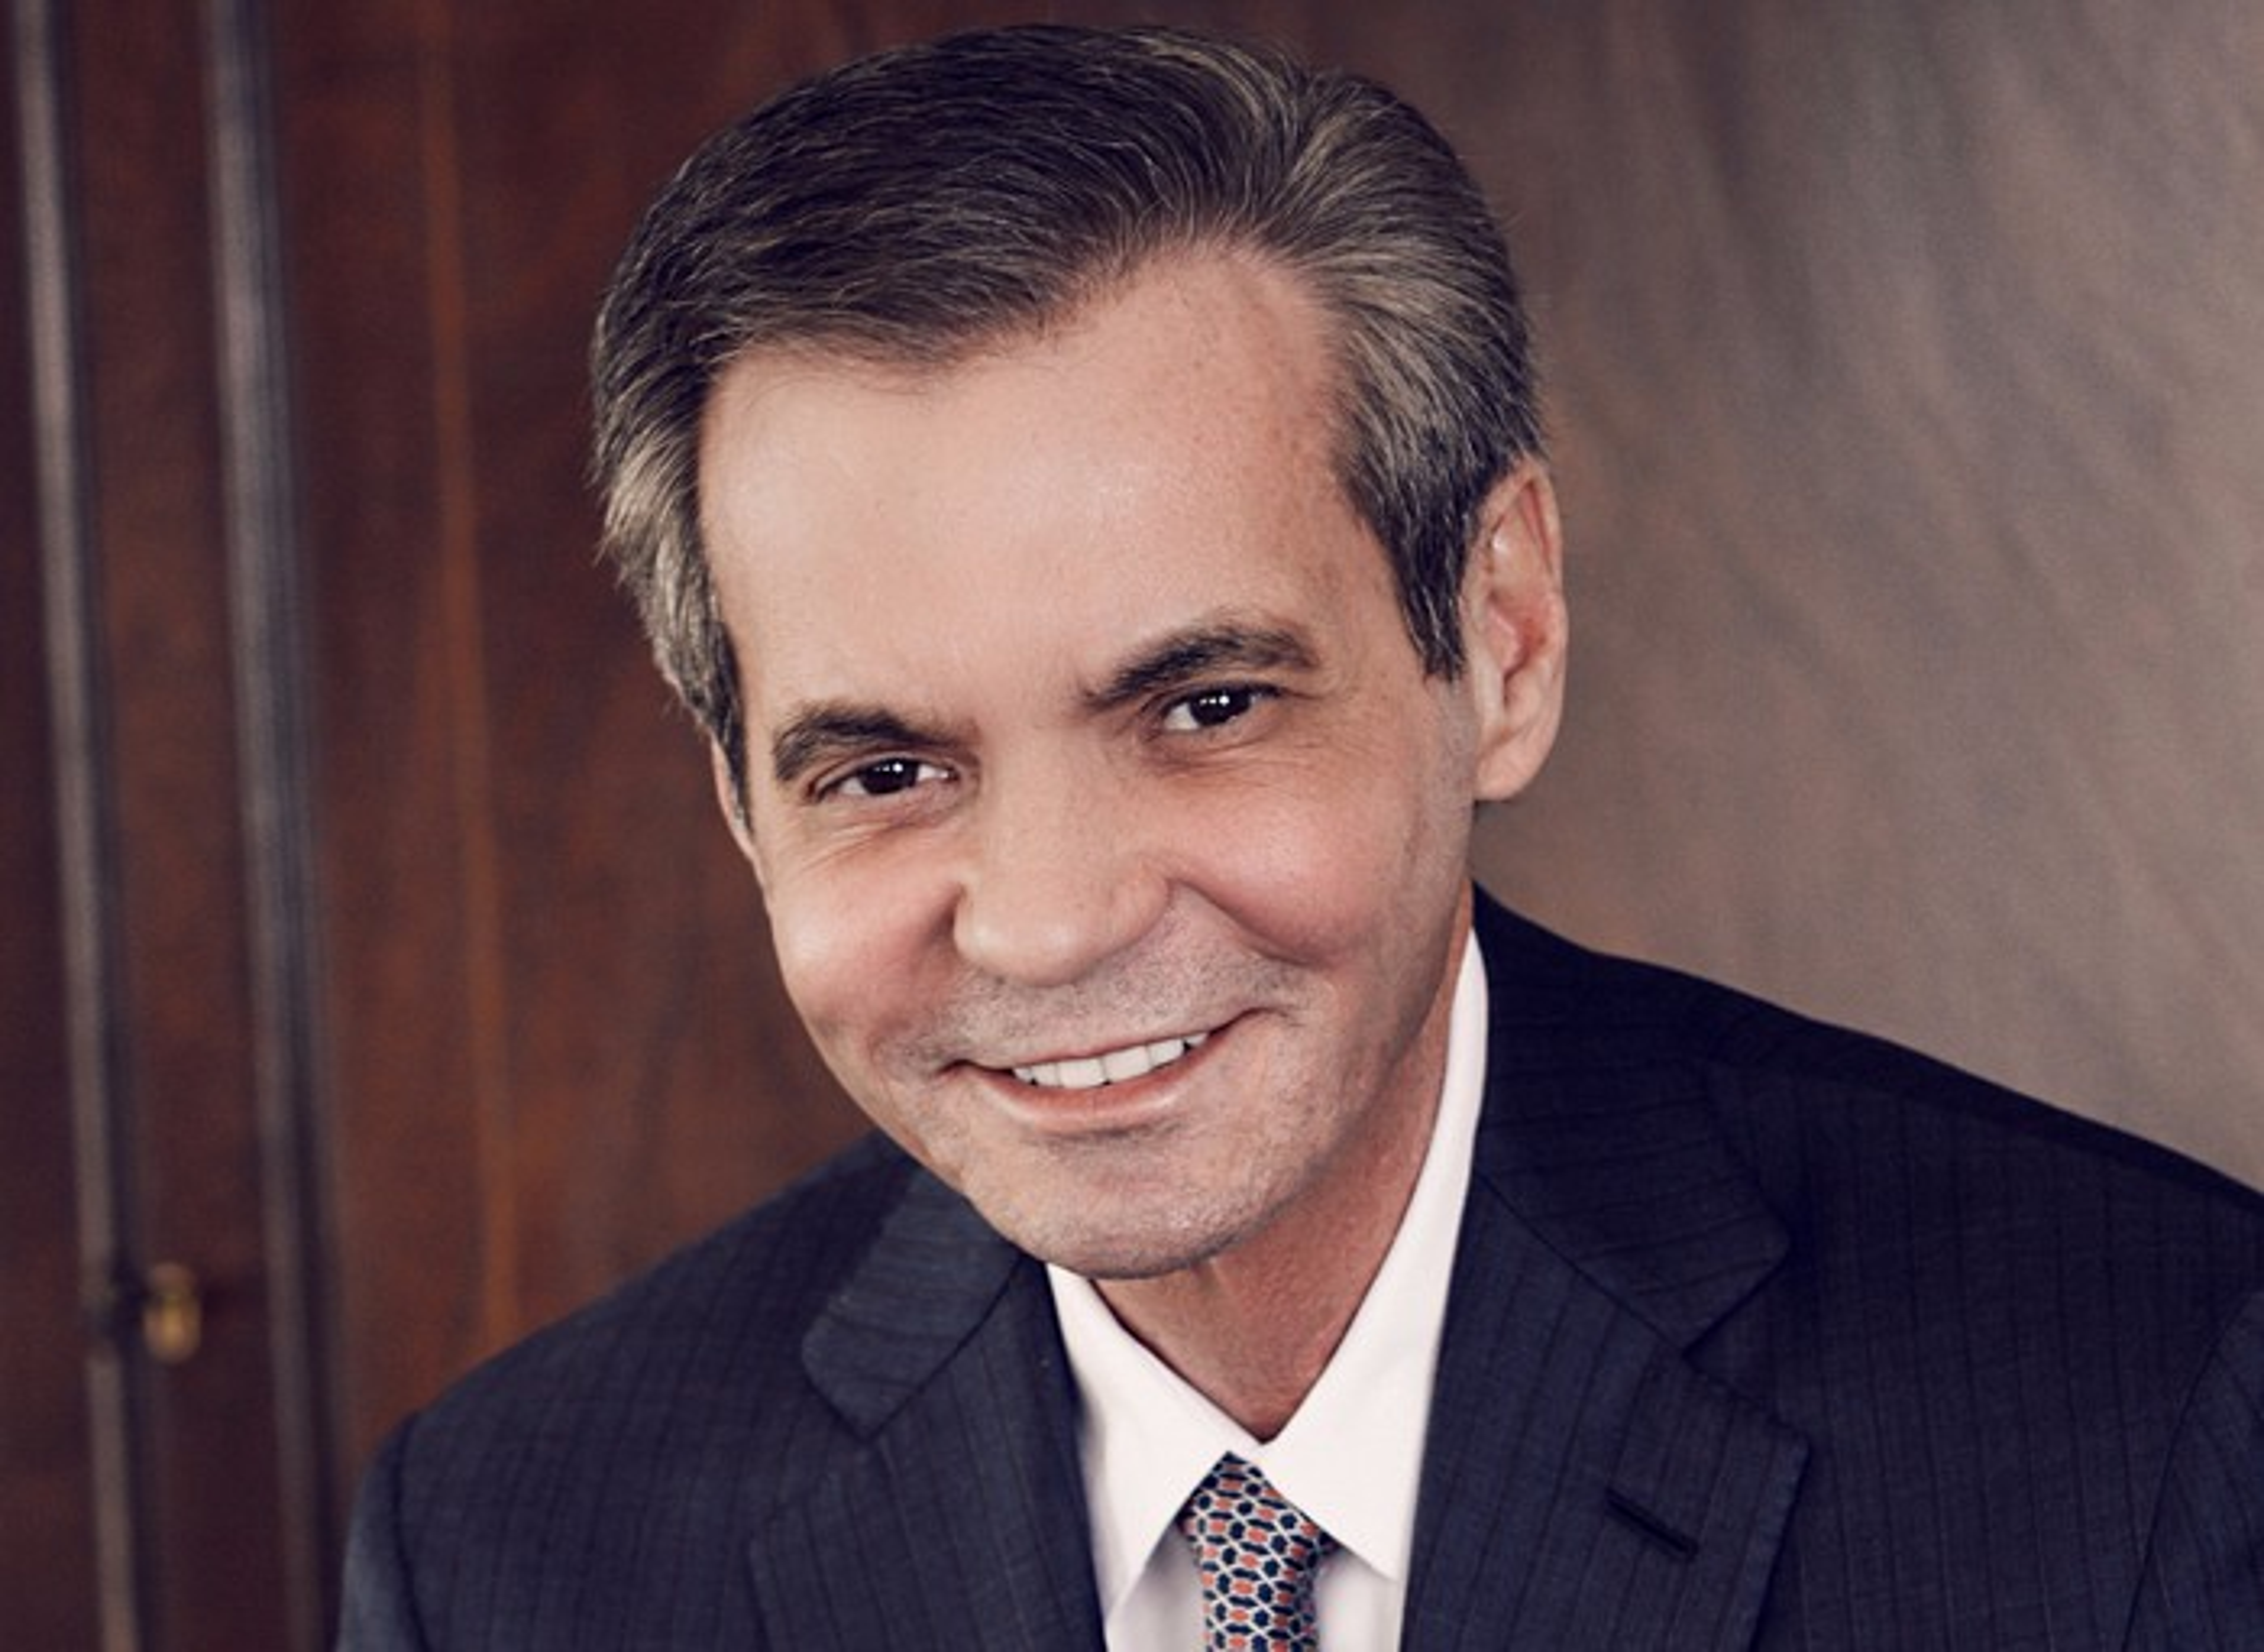 AbbVie Inc. CEO Richard A. Gonzalez